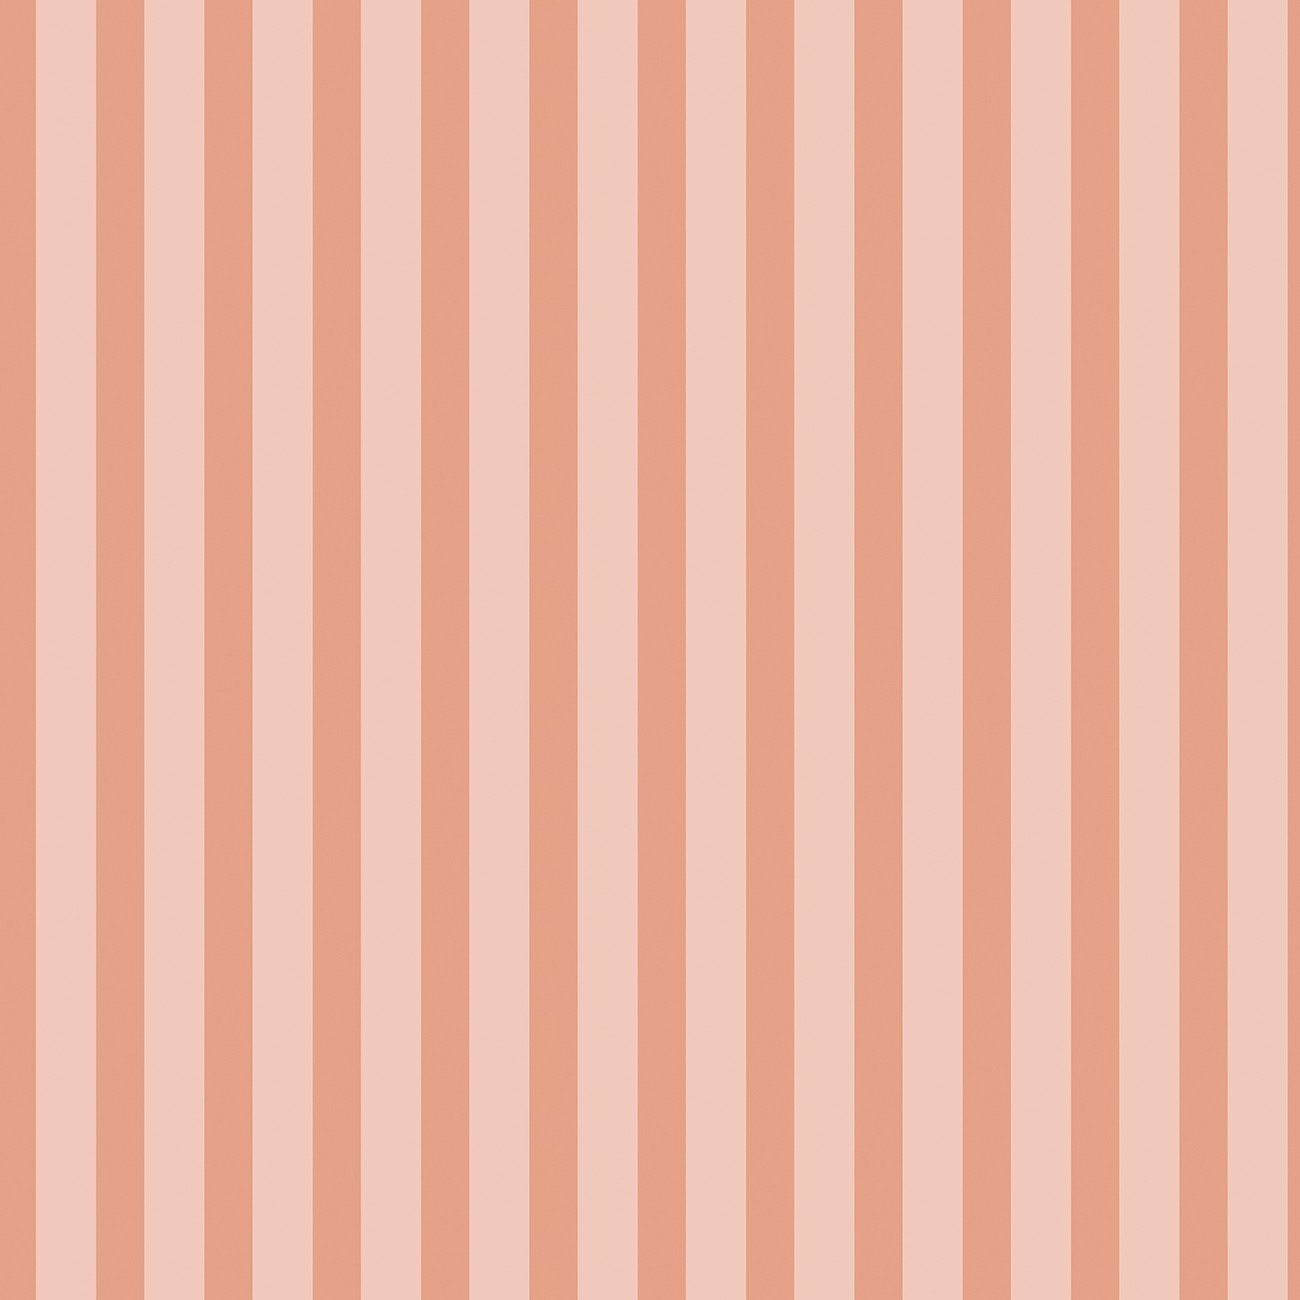 Ava Kate Stripes Blush